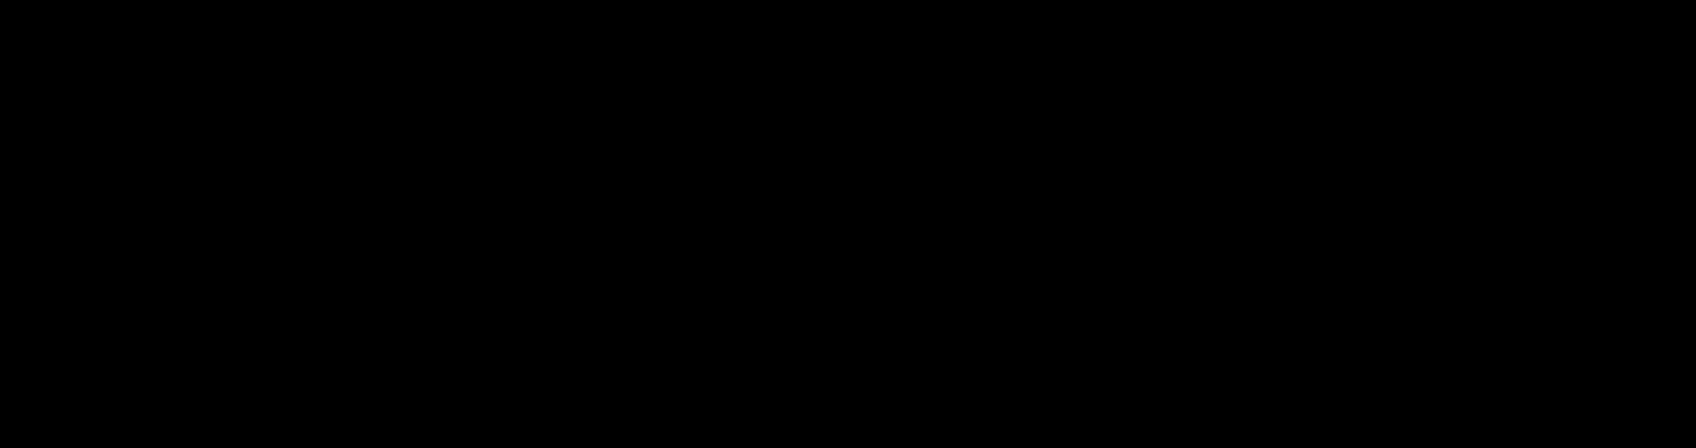 img18